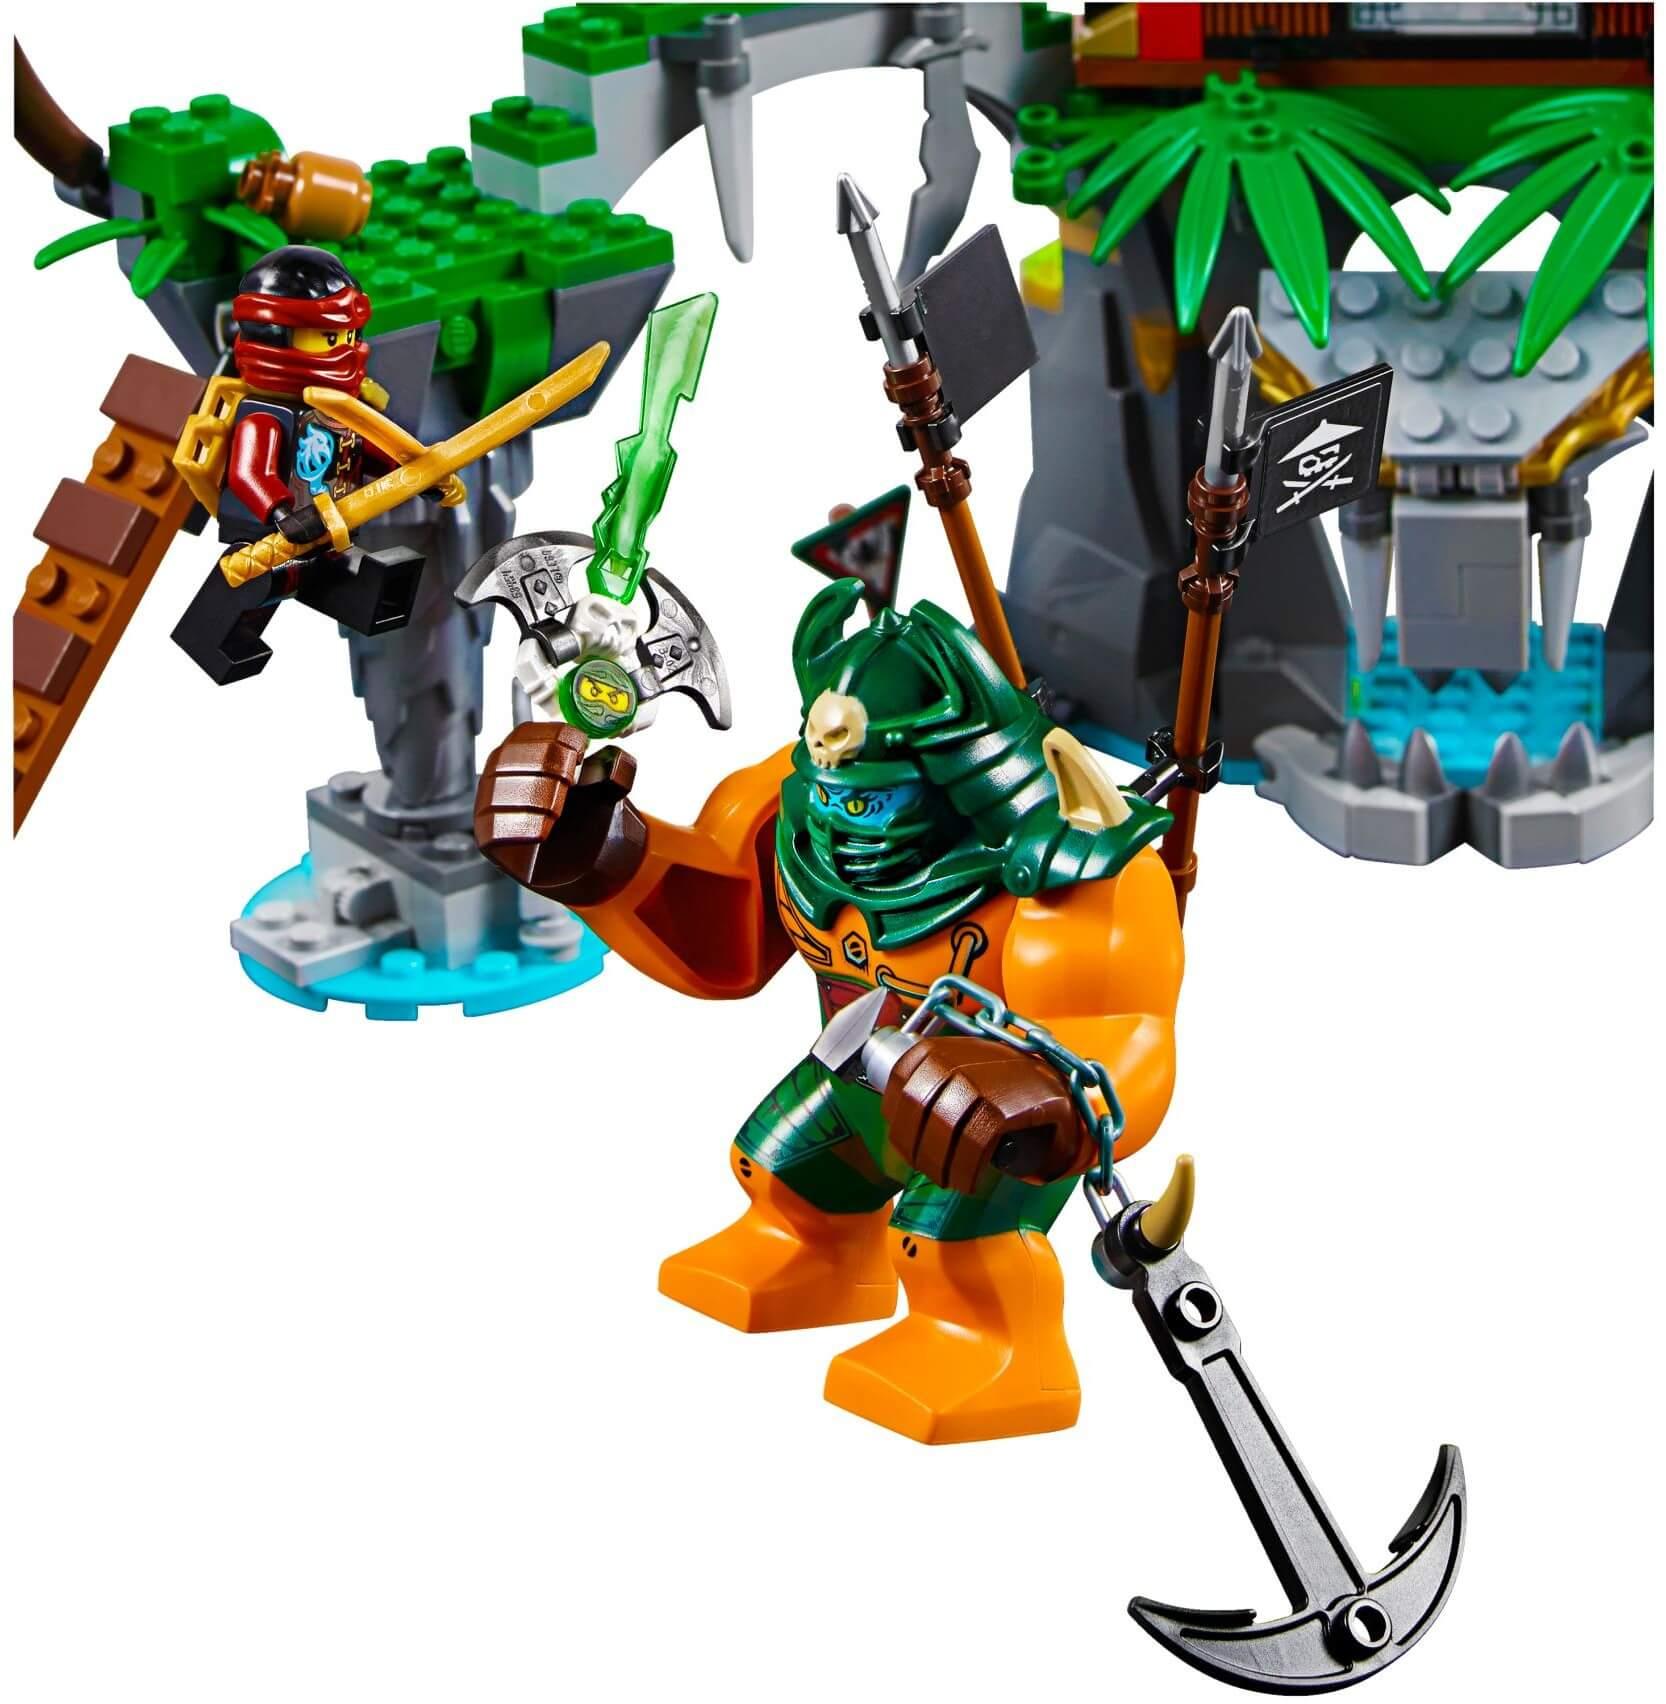 Mua đồ chơi LEGO 70604 - LEGO Ninjago 70604 - Hòn đảo Tiger Widow (LEGO Ninjago Tiger Widow Island 70604)